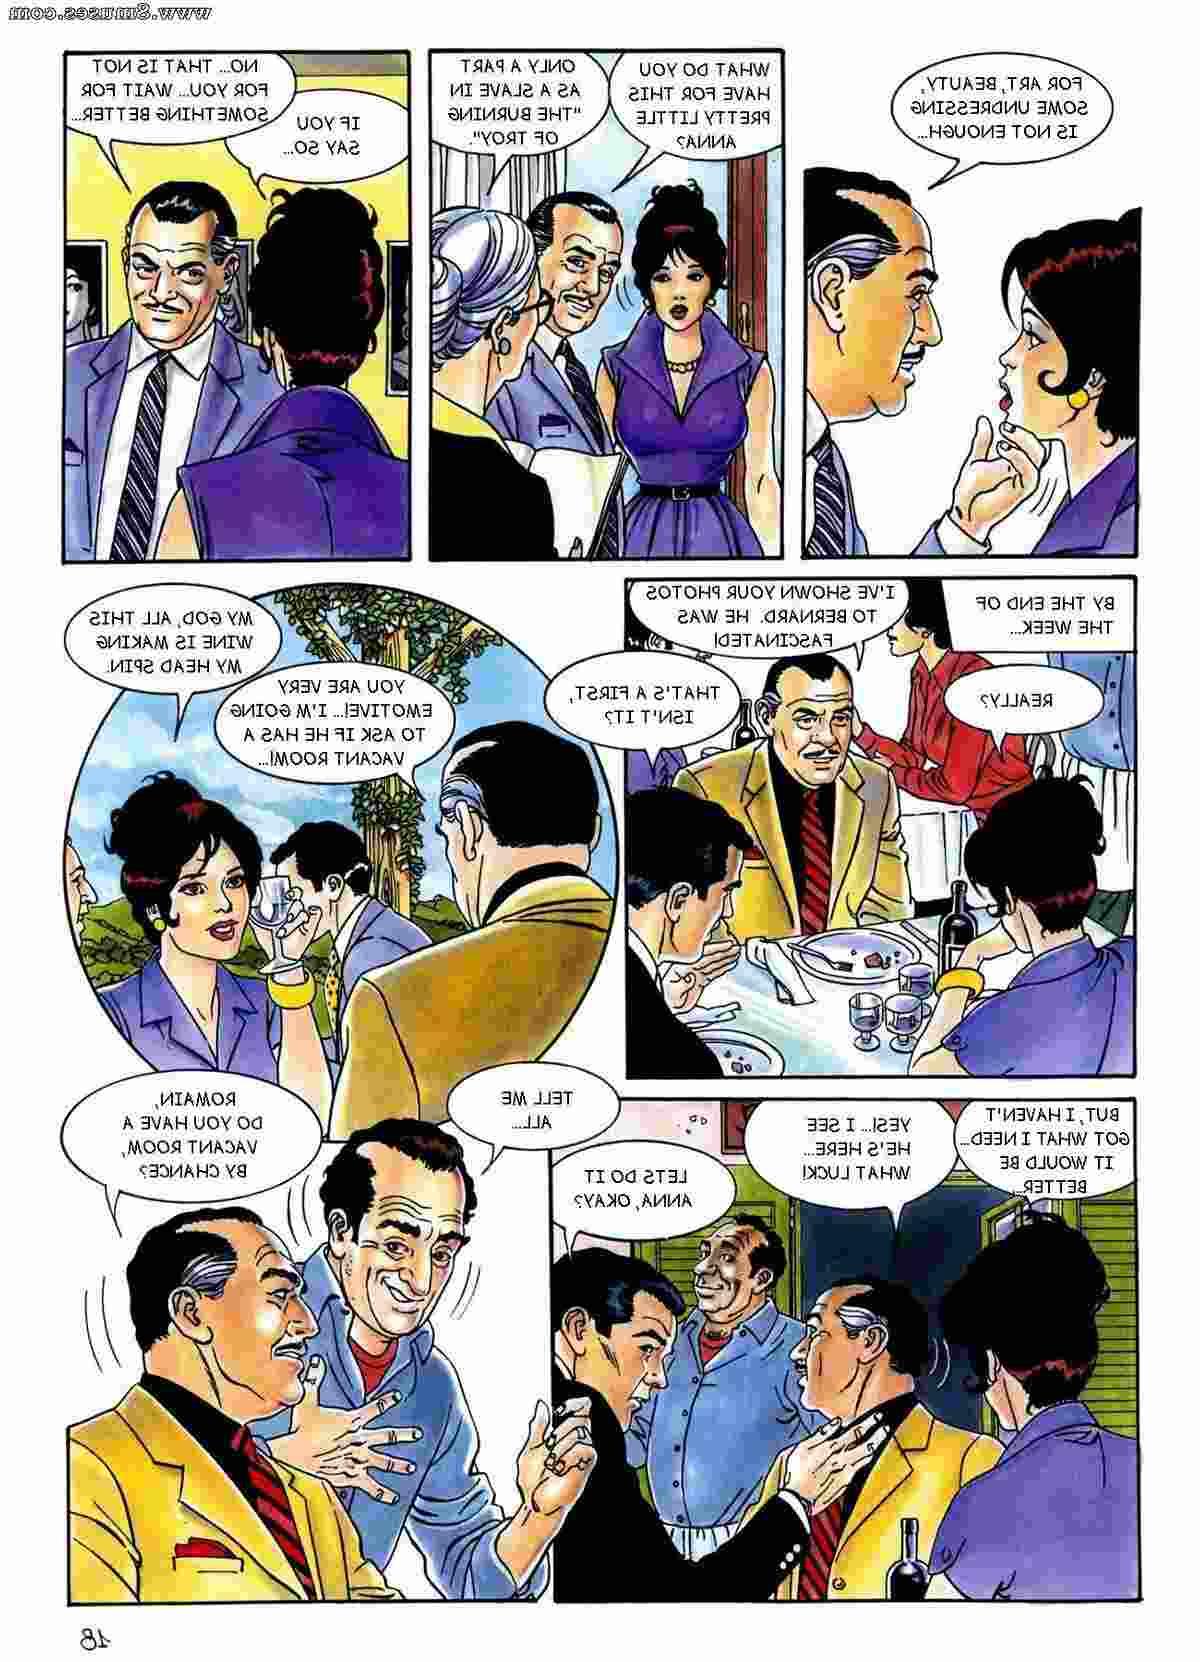 Stramaglia-Morale-Comics/Anna-Perverted-Innocence Anna_Perverted_Innocence__8muses_-_Sex_and_Porn_Comics_21.jpg